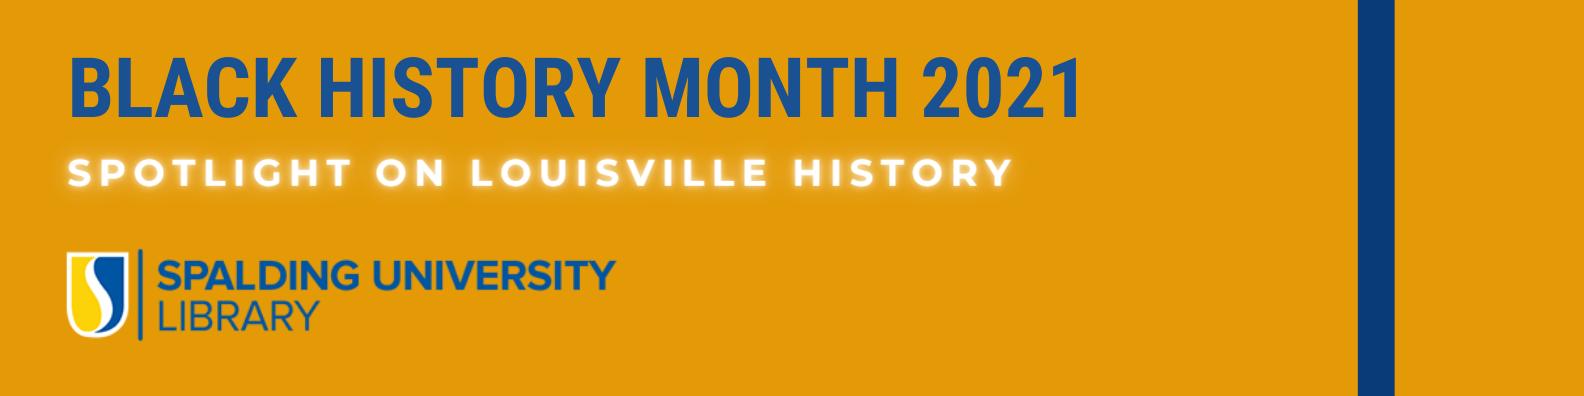 Black History Month 2021: Spotlight on Louisville's History